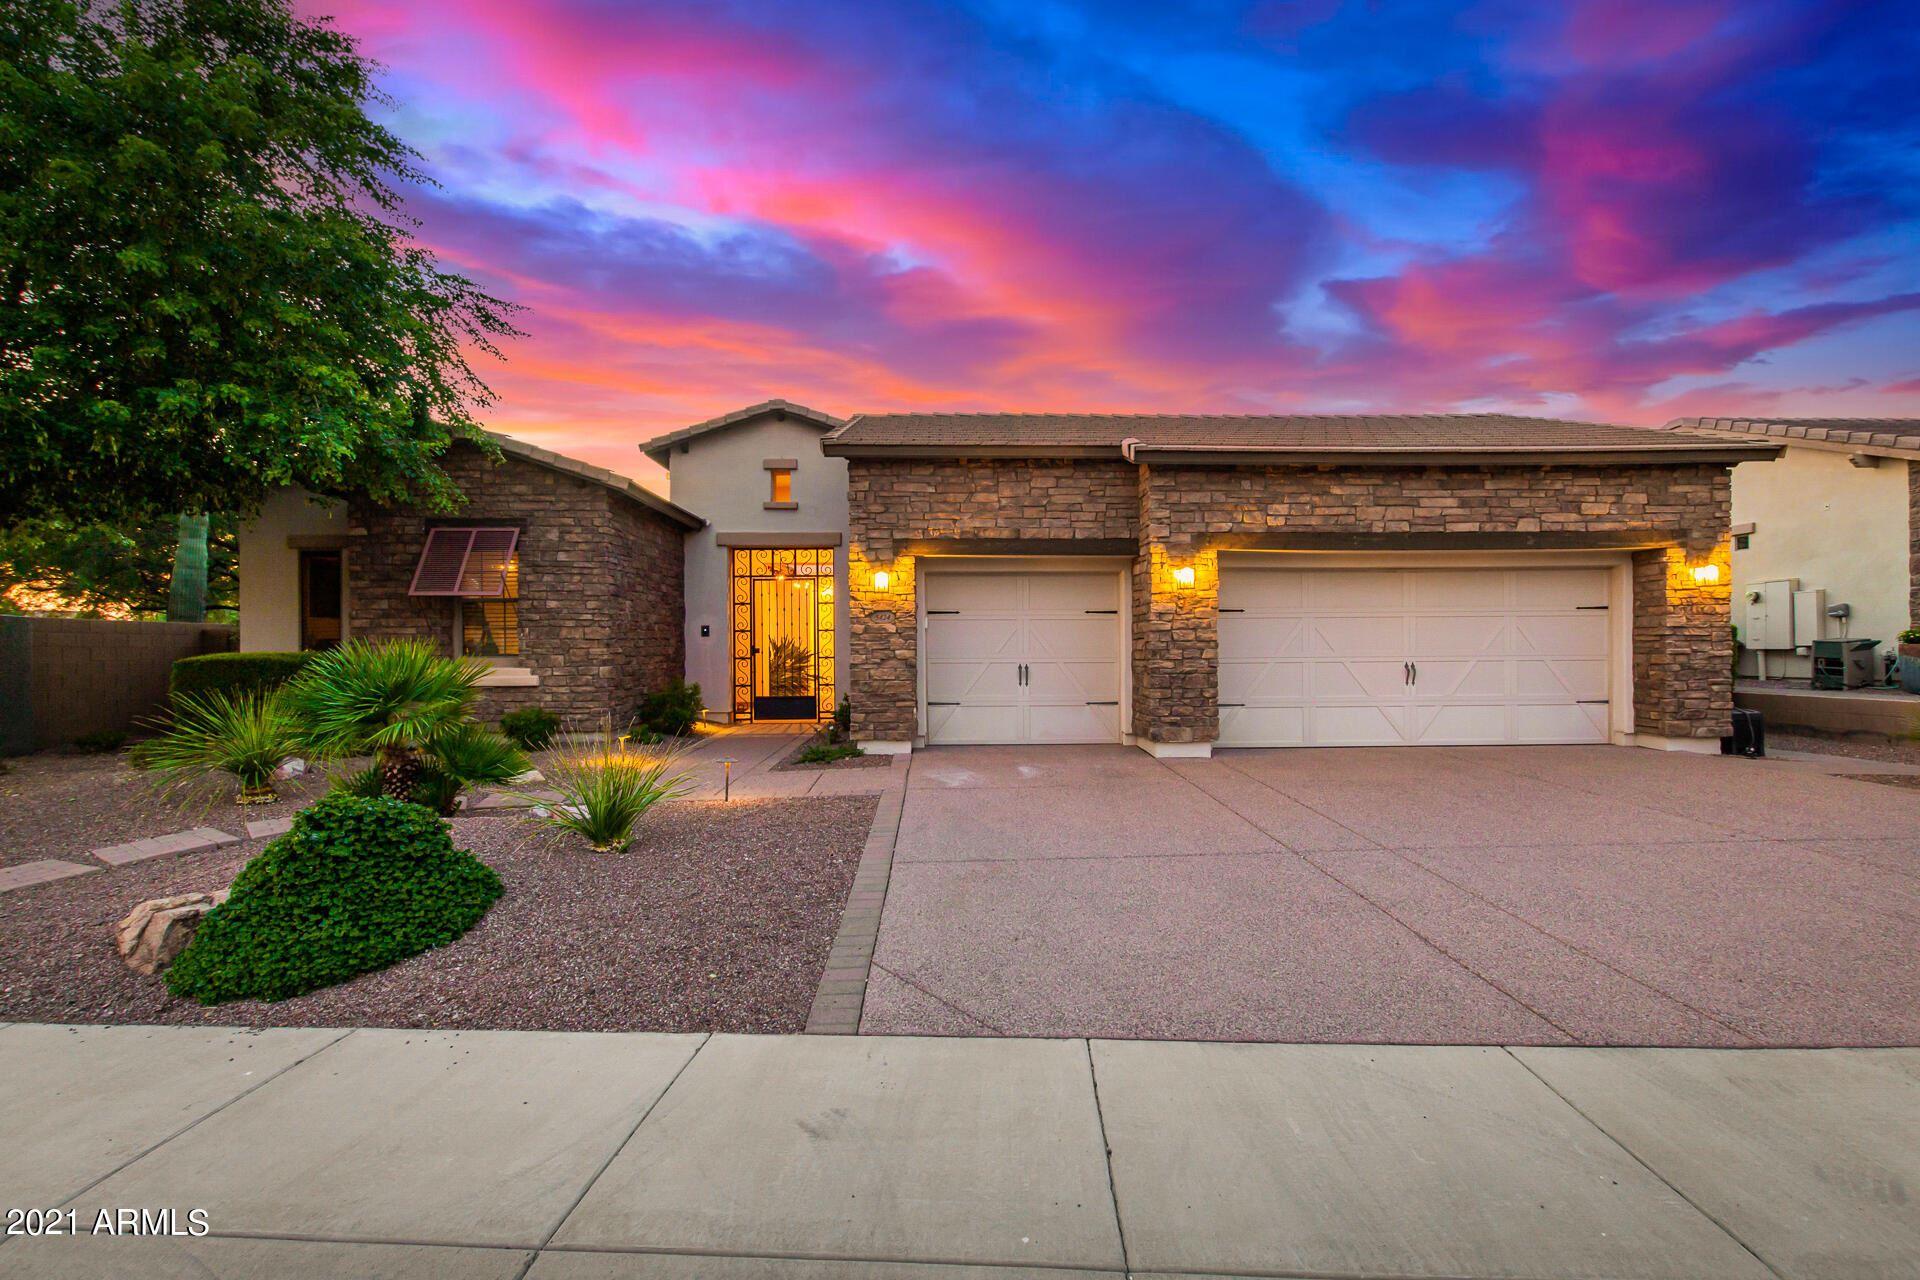 Photo of 5424 E Milton Drive, Cave Creek, AZ 85331 (MLS # 6292218)